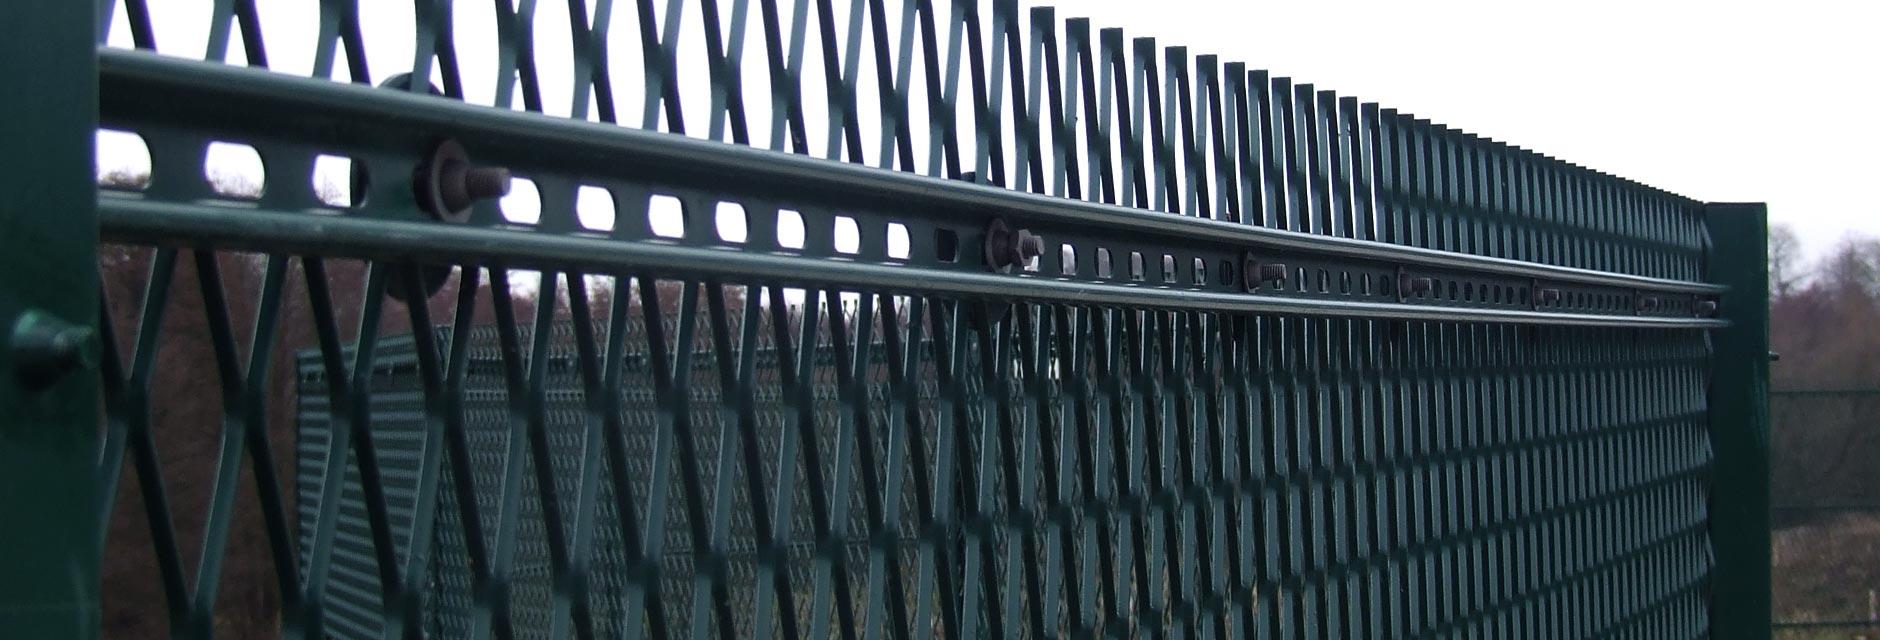 FastGuard: Expanded Metal Fencing